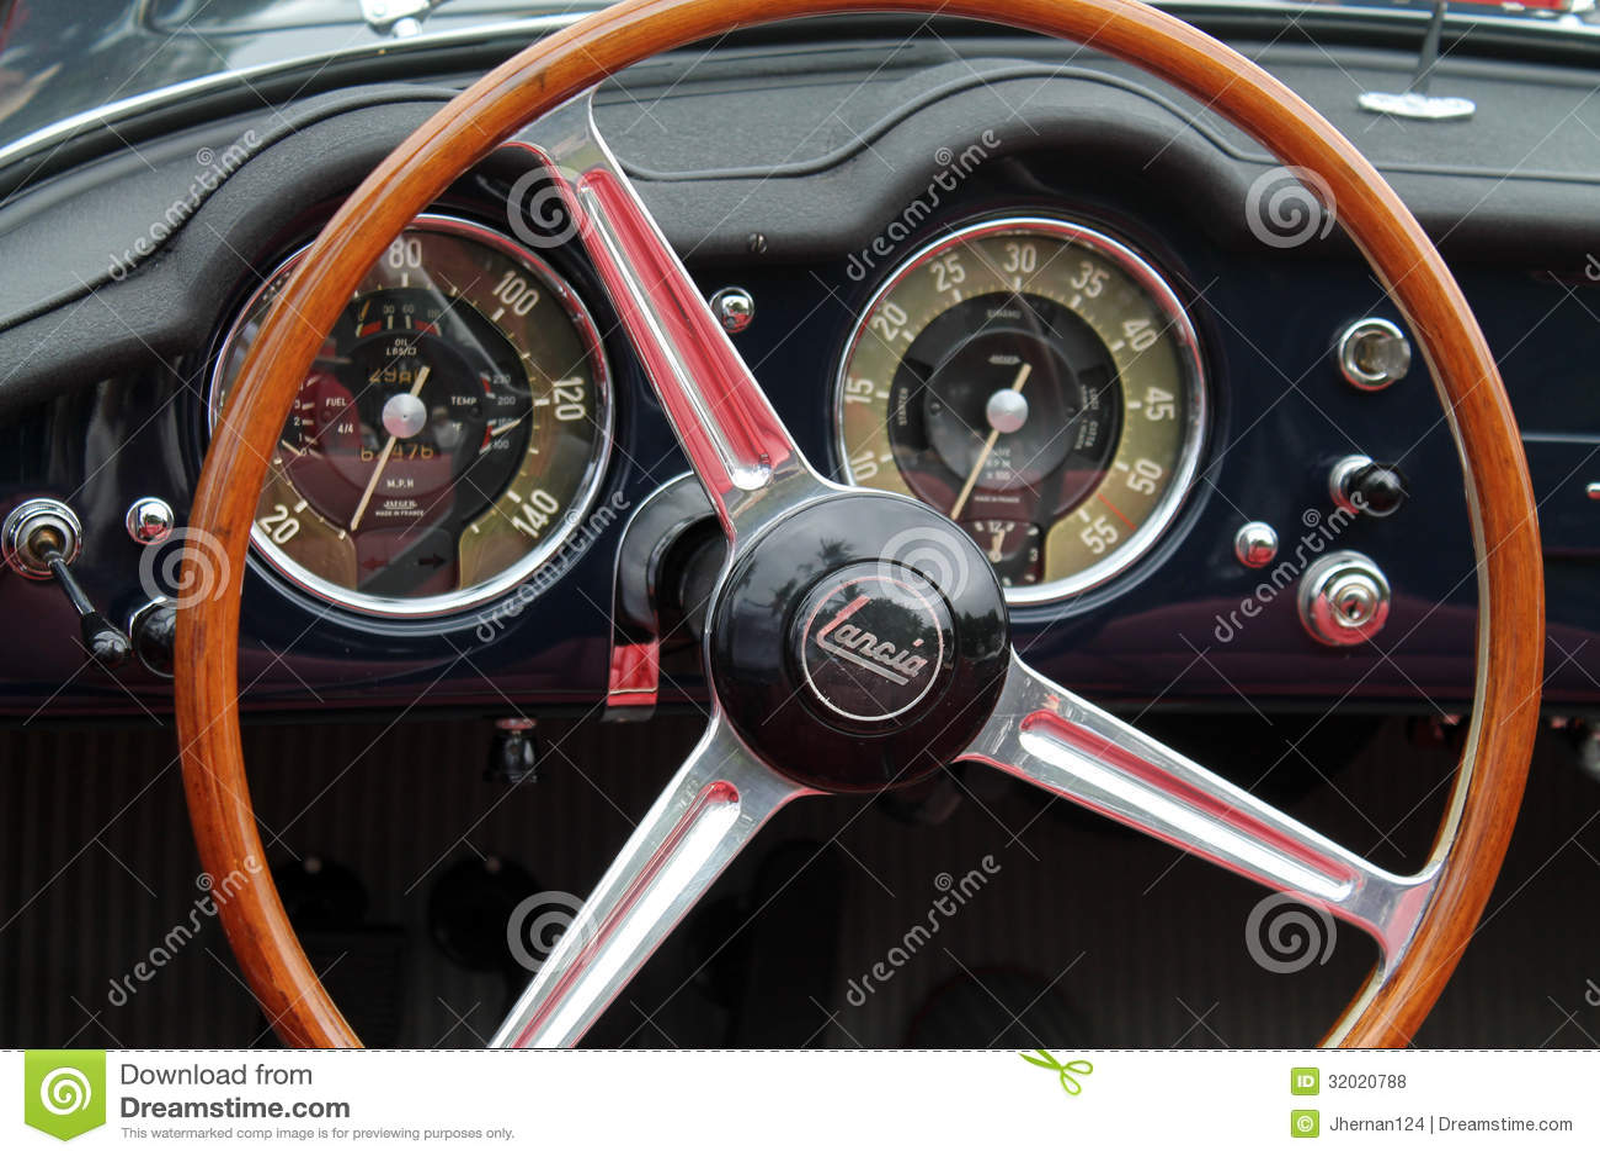 classic italian convertible sports car interior editorial stock photo image 32020788. Black Bedroom Furniture Sets. Home Design Ideas